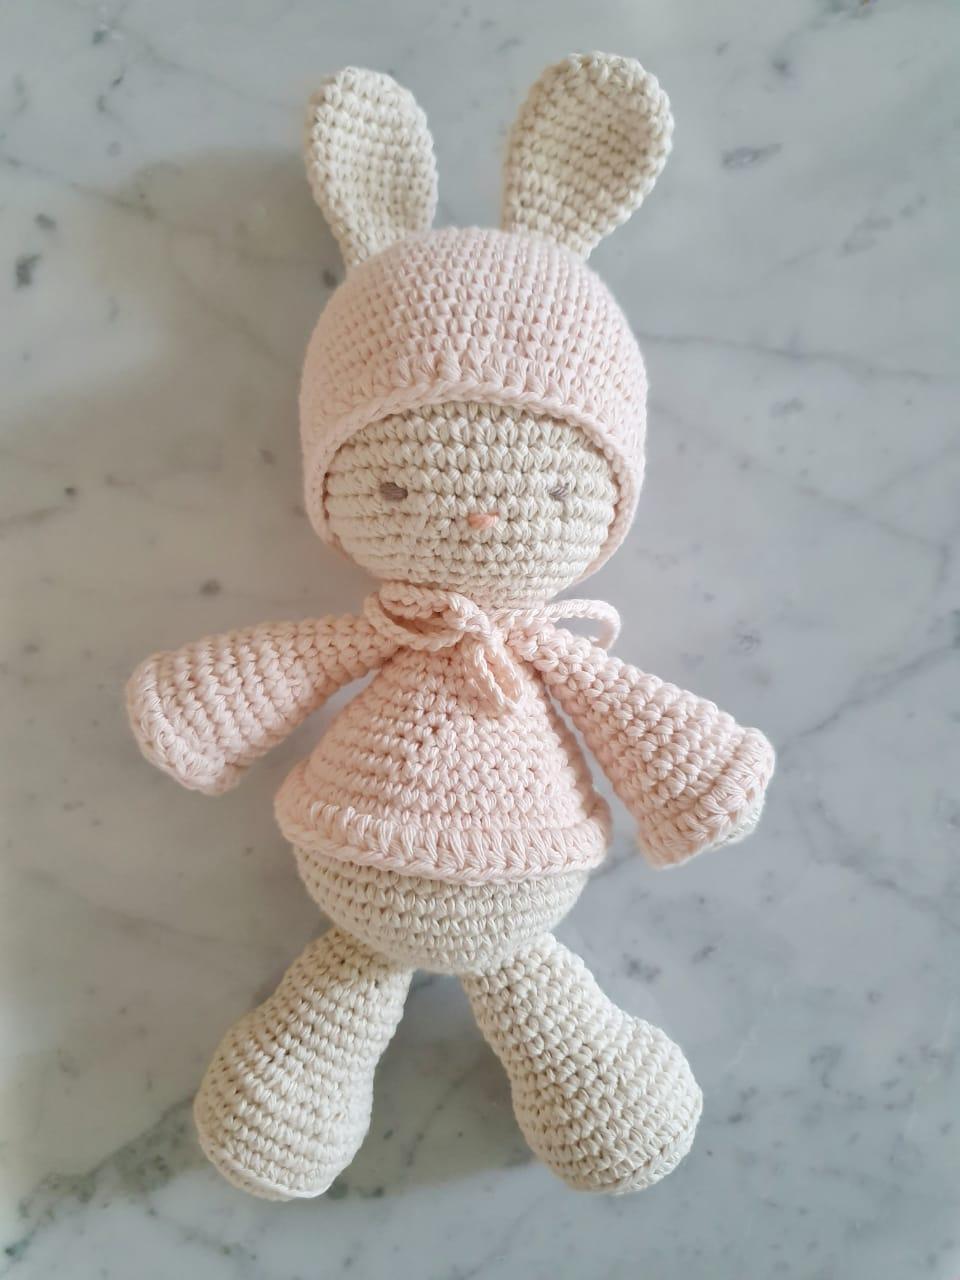 muñeco_apego_amigurumi_tejido